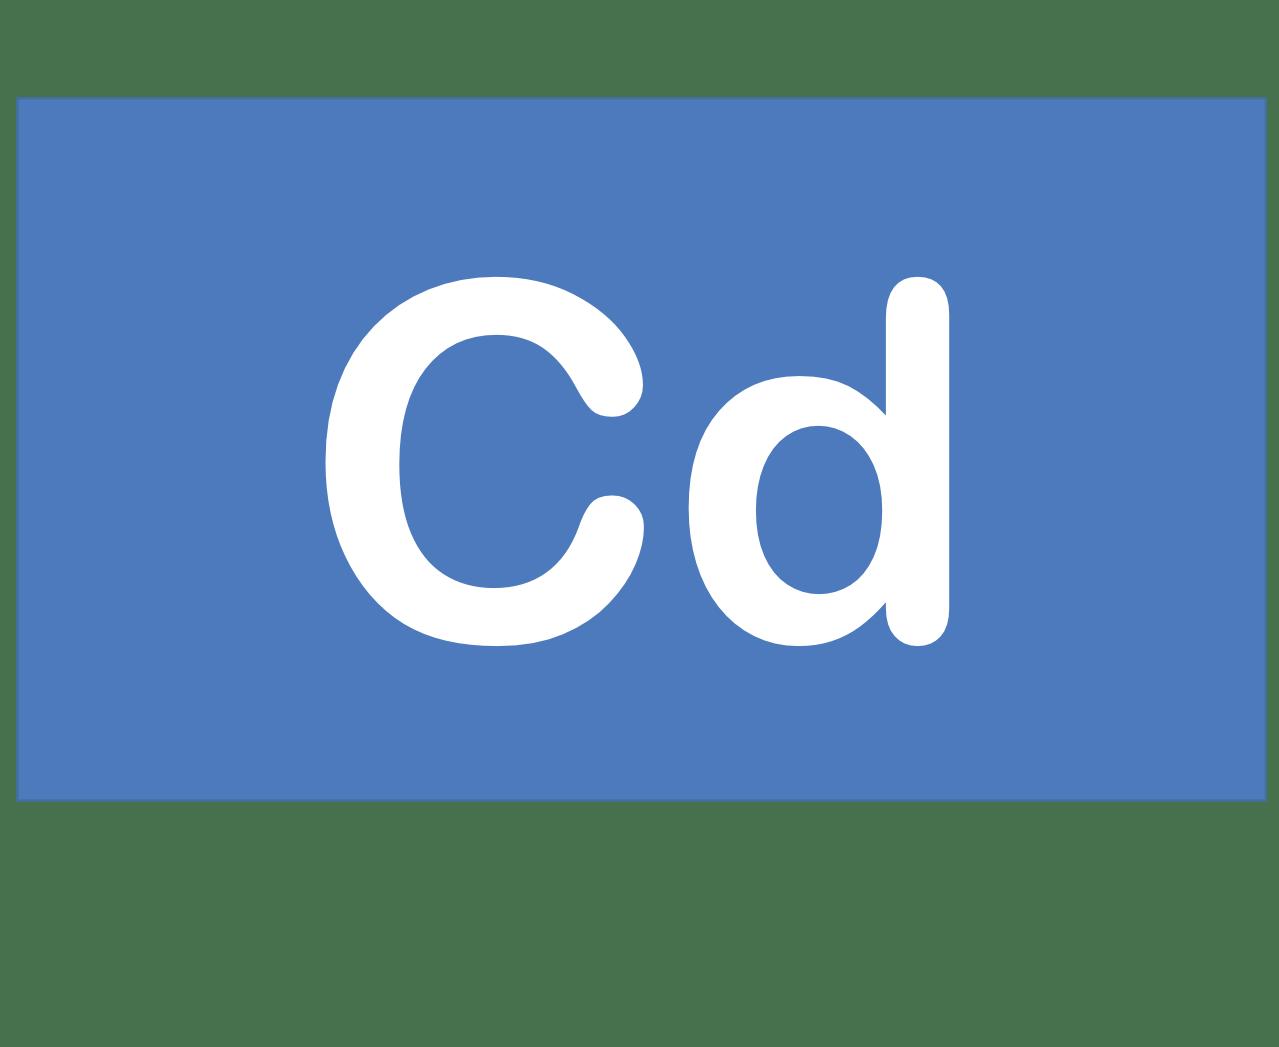 48 Cd カドミウム Cadmium 元素 記号 周期表 化学 原子